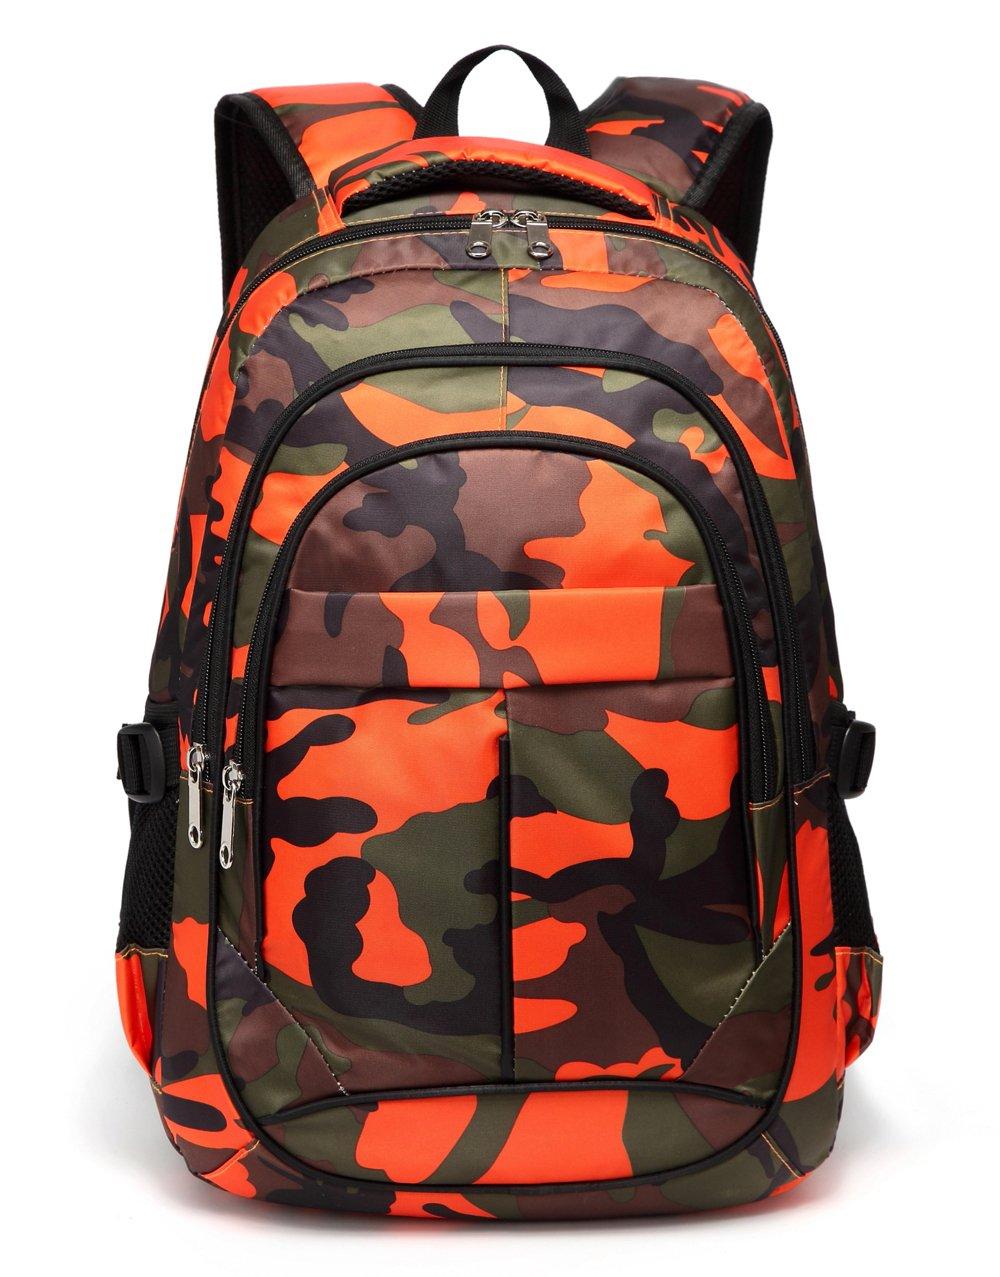 Kids School Backpacks for Boys Camouflage School Bags Durable Bookbags for Children Girls (Camo Orange) by BLUEFAIRY